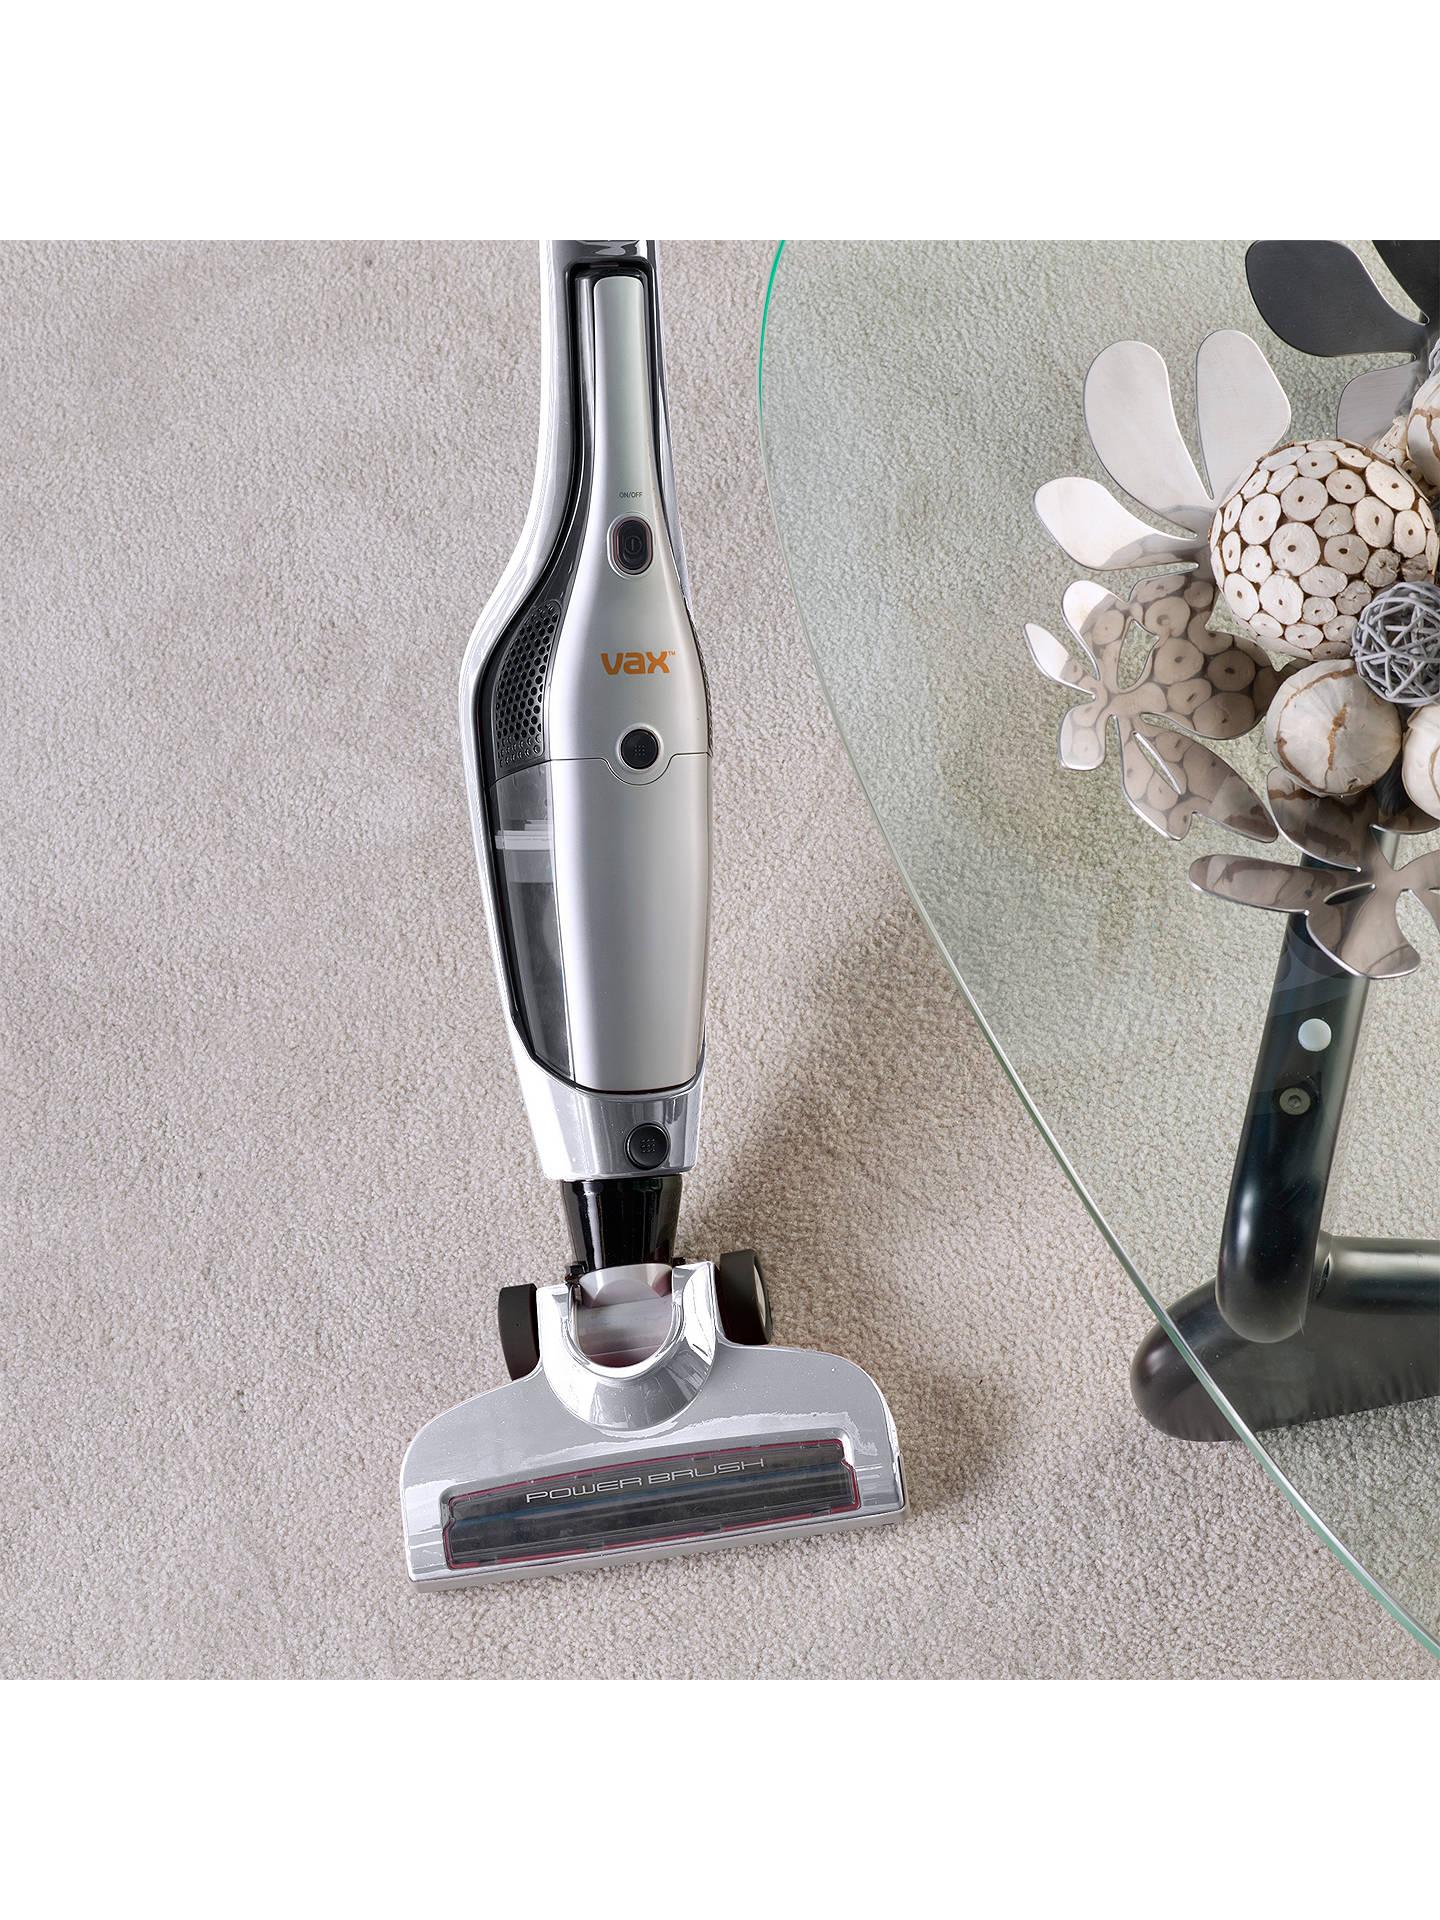 Vax Dynamo Cordless Vacuum Cleaner